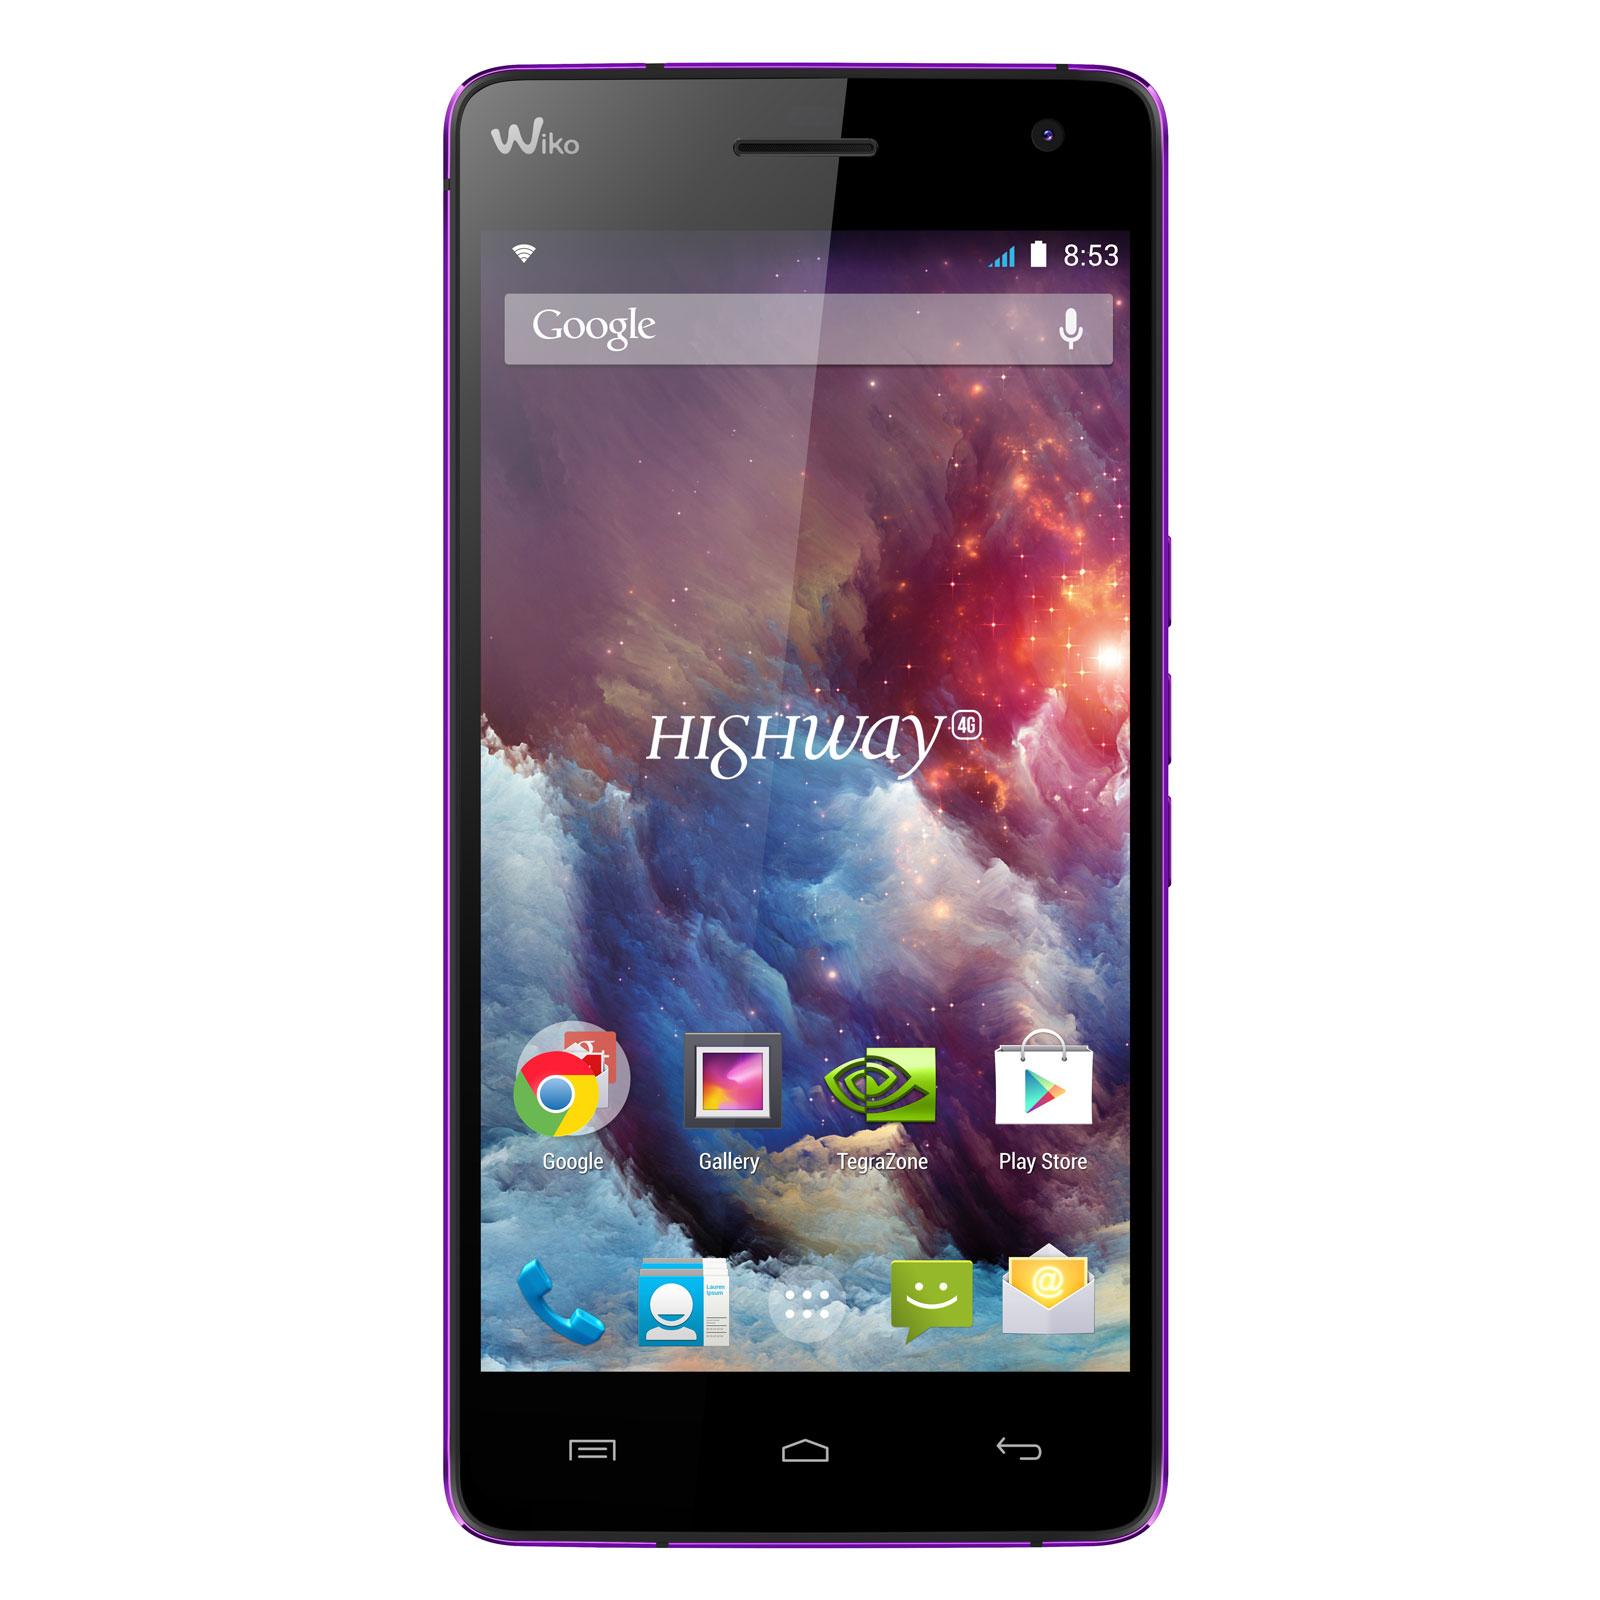 "Mobile & smartphone Wiko Highway 4G Violet Smartphone 4G-LTE - NVIDIA Tegra 4i Quad-Core 2 GHz - RAM 2 Go - Ecran tactile 5"" 1080 x 1920 - 16 Go - Bluetooth 4.0 - 2350 mAh - Android 4.4"